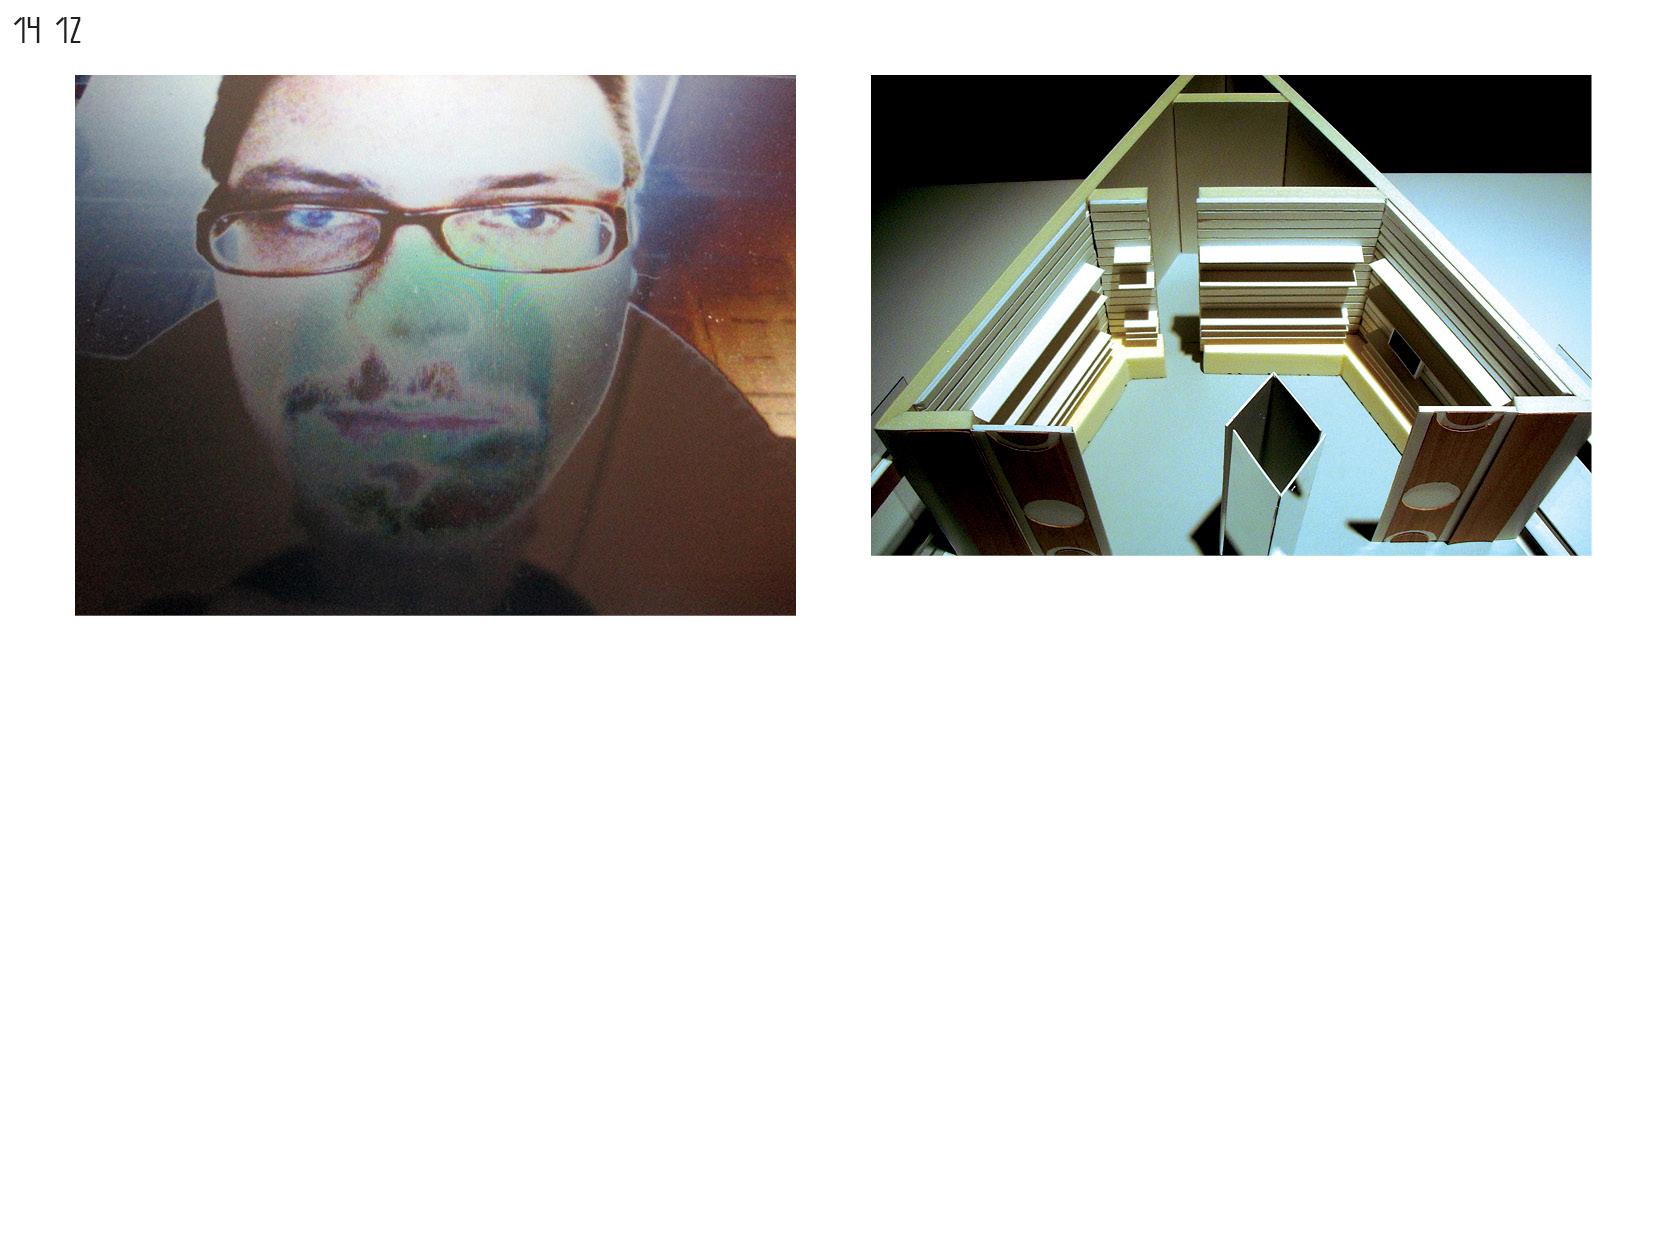 Gerrit-Schweiger-Dialog-Städte-Paris-Berlin-Jessica-Blank-Experiment-Fotoserie-Tagebuch-visuelle-Kommunikation-55